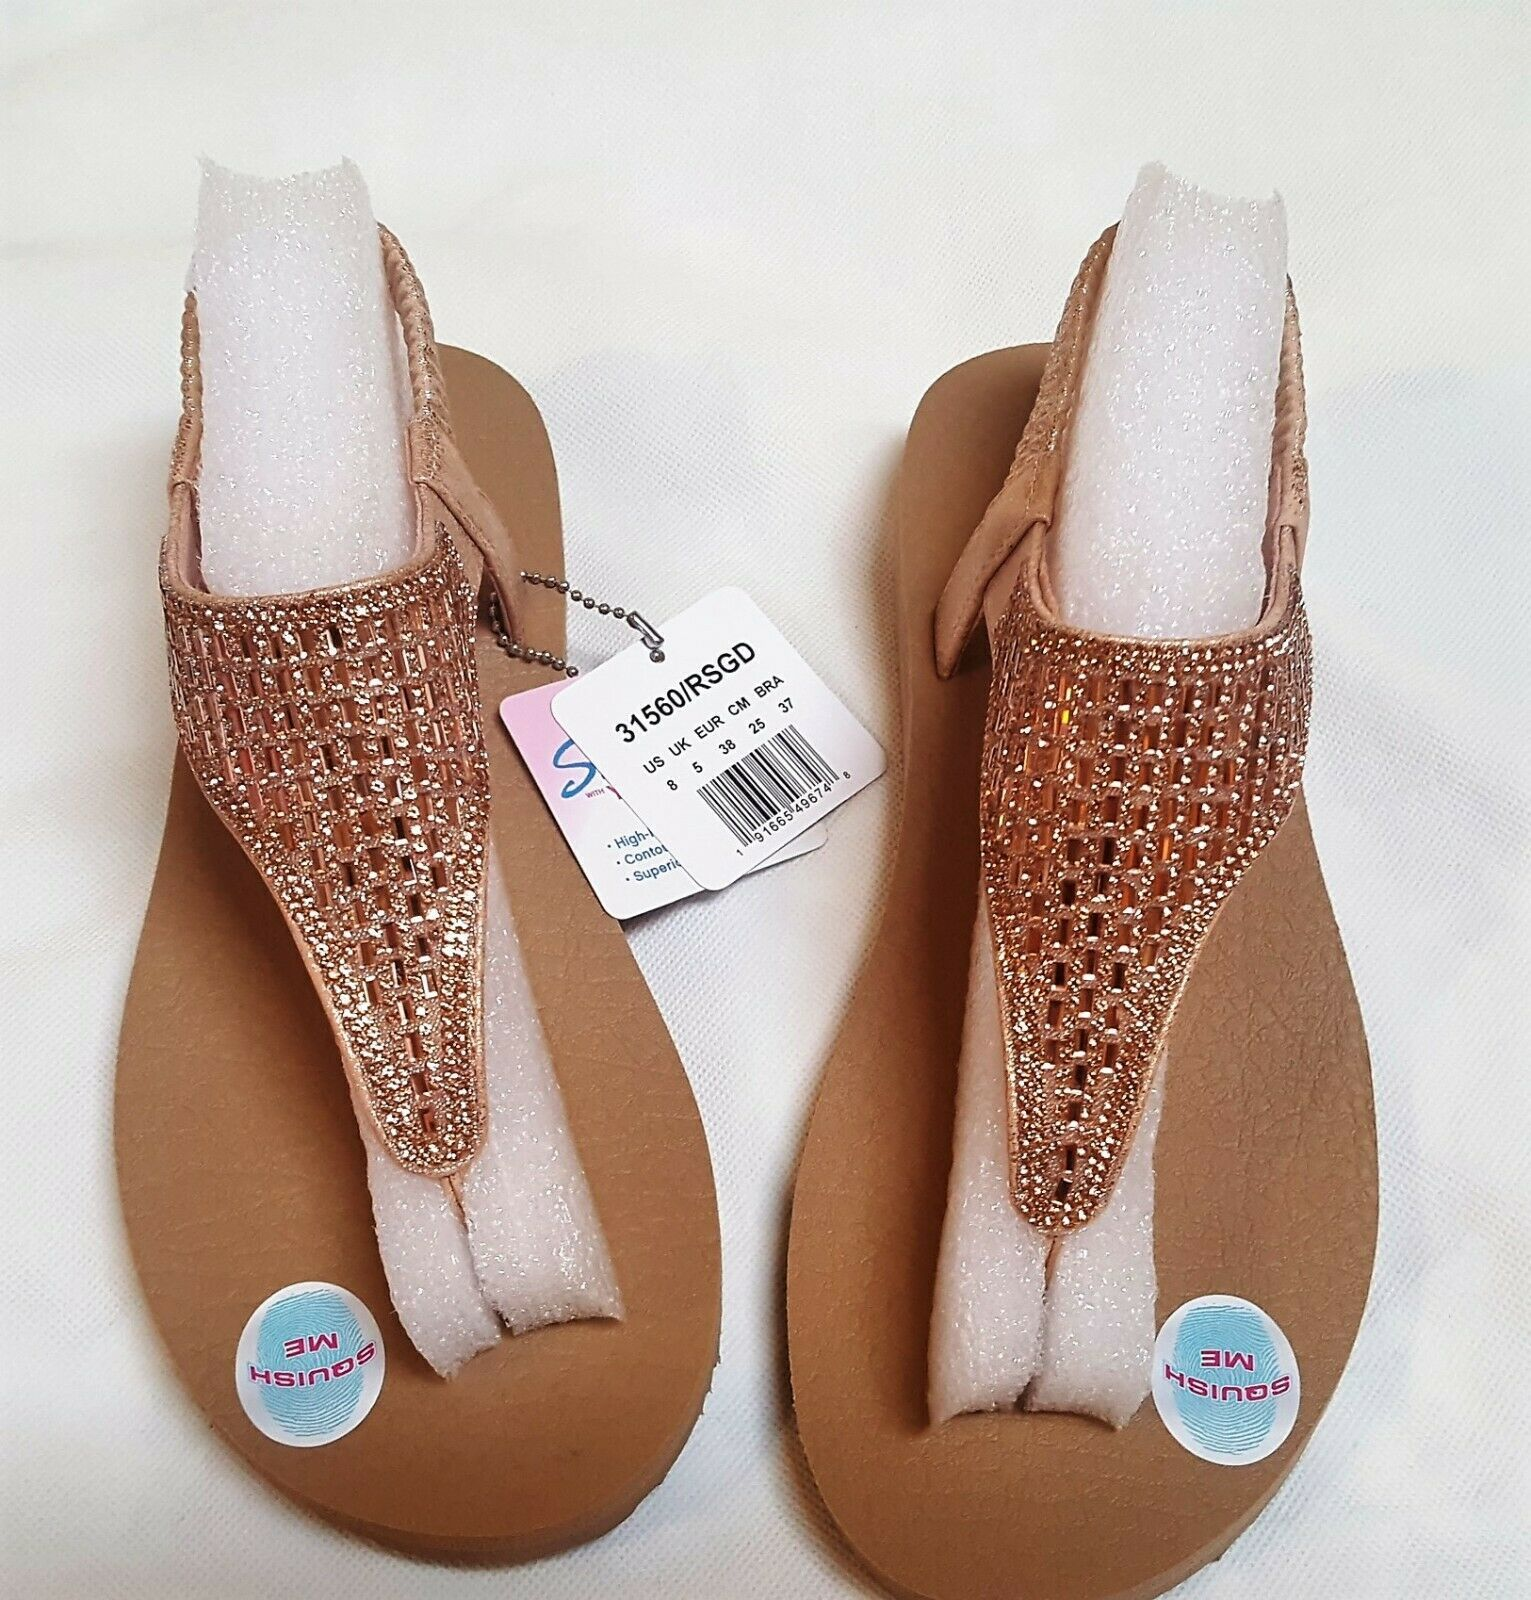 Womens Skechers 31560 Cali Meditation Rock Crown  Sandals Flip Flops size 8M image 3